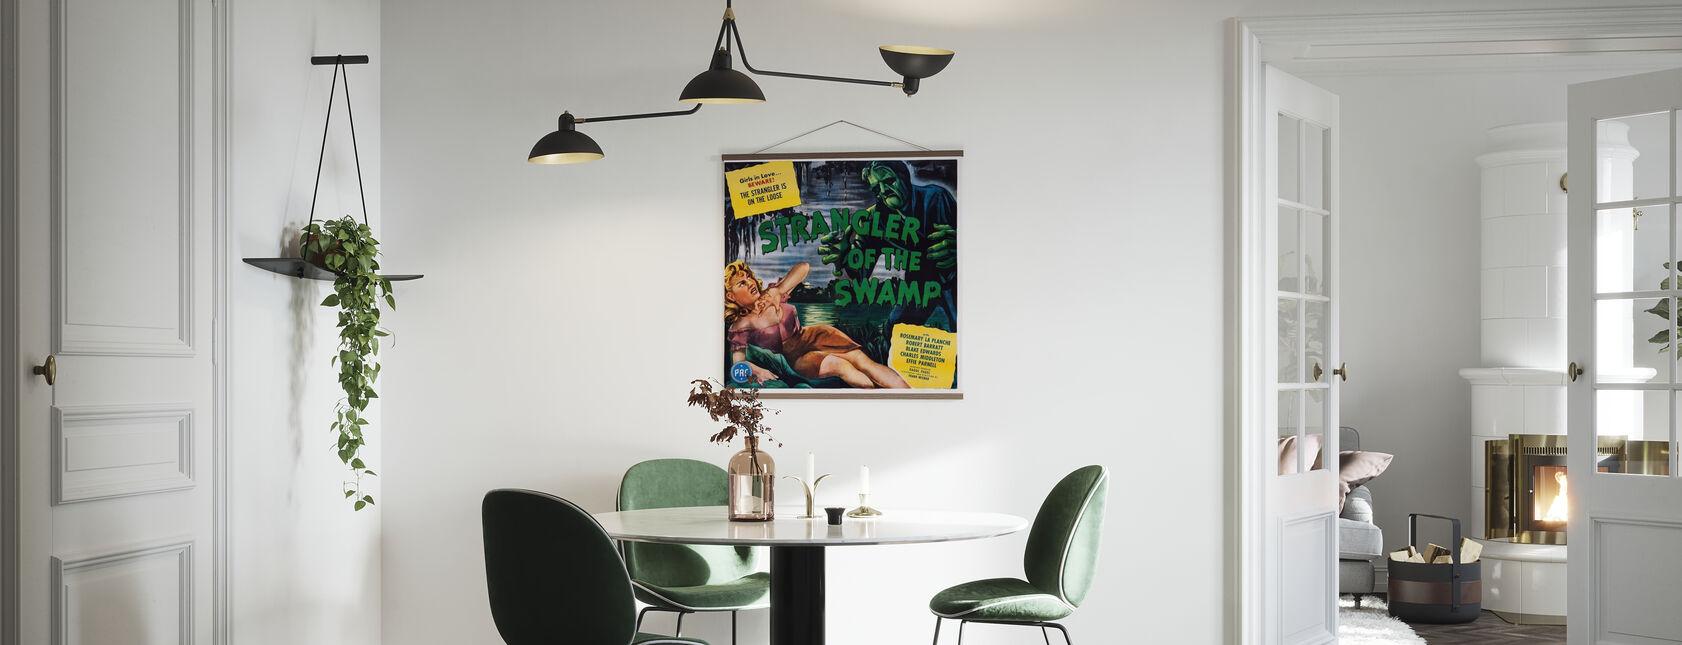 Movie Poster Strangler of the Swamp - Poster - Kitchen